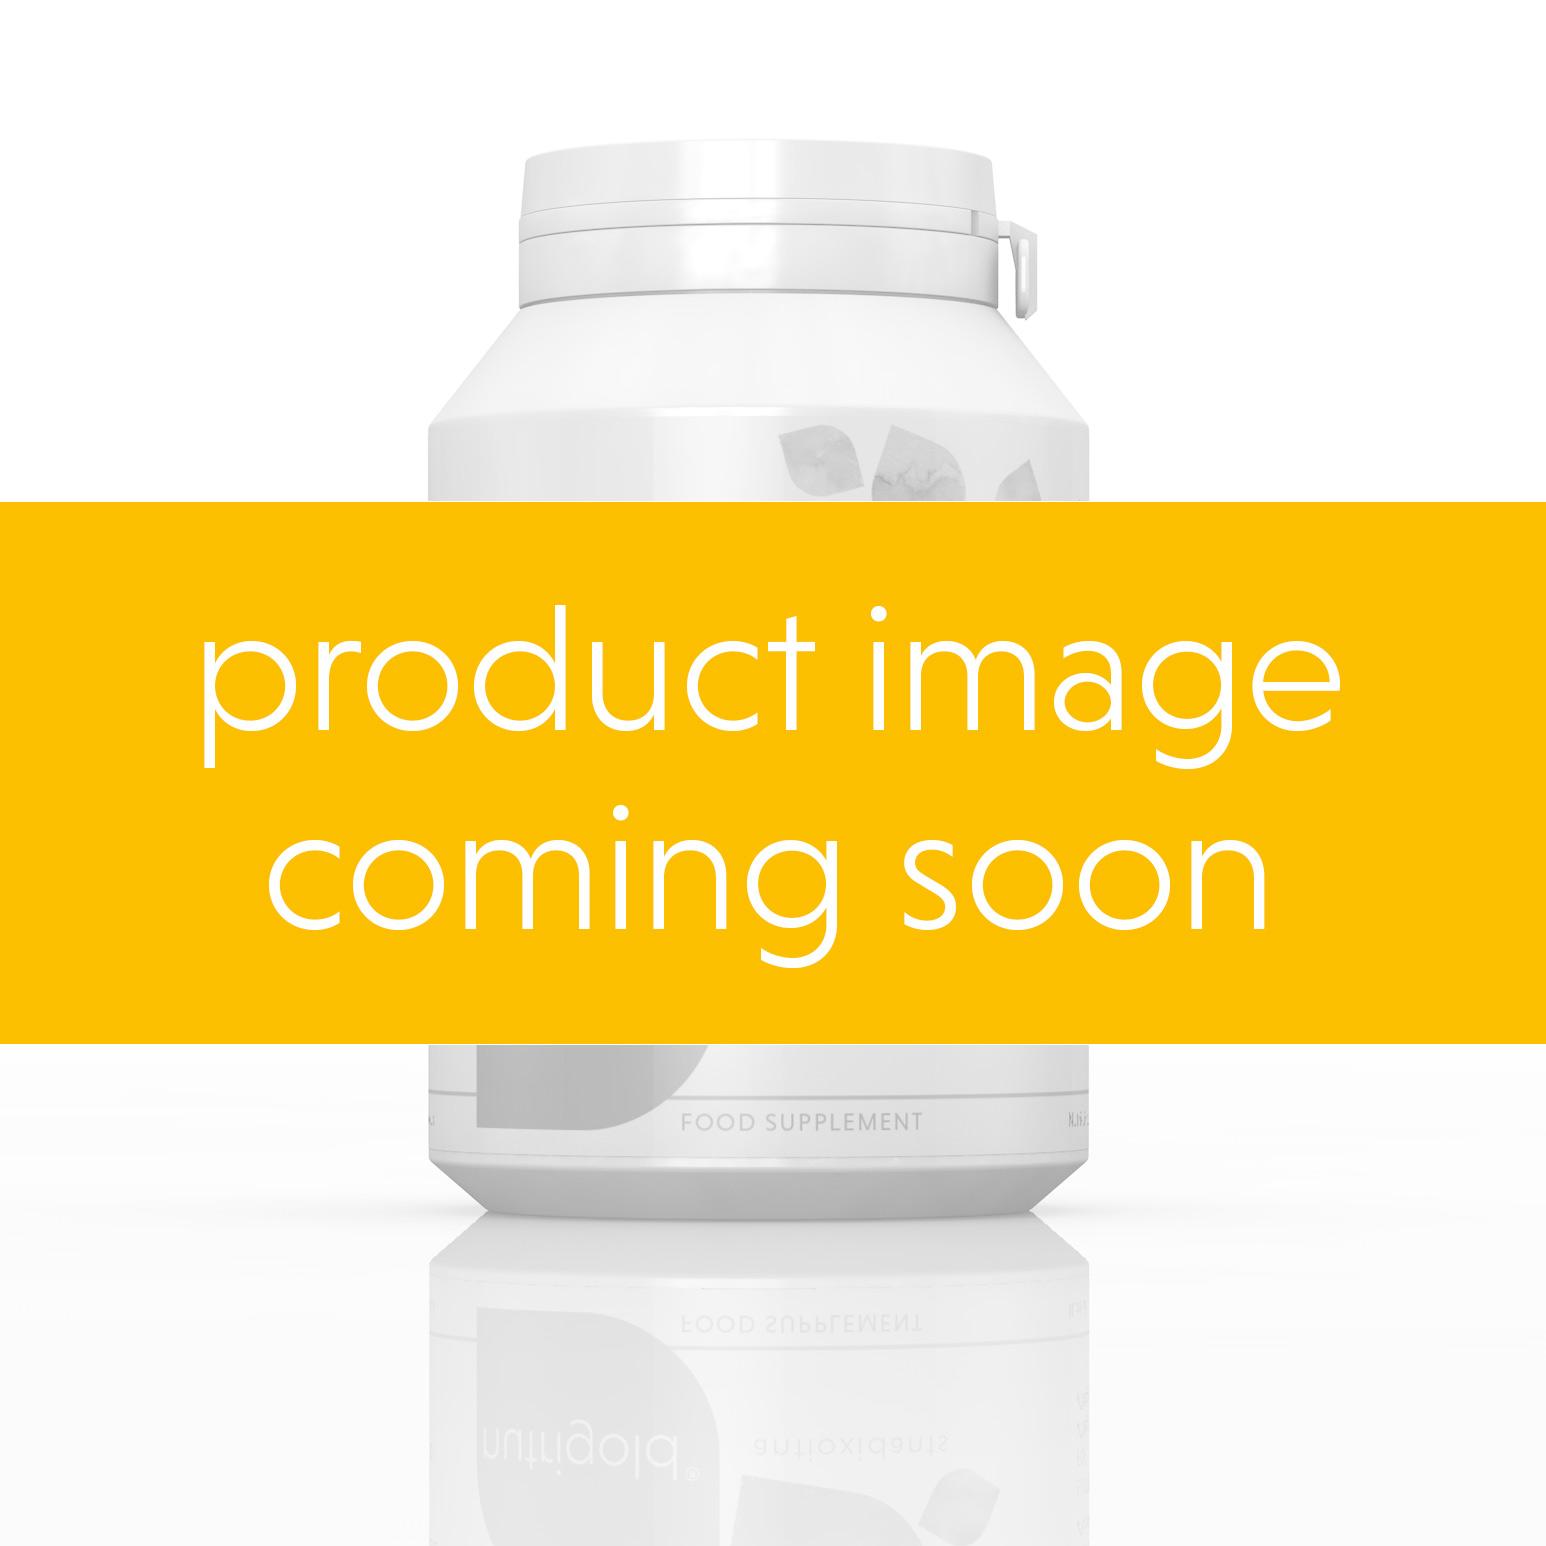 Vitamin D3 Spray x 100ml EXP DATE 30.08.20